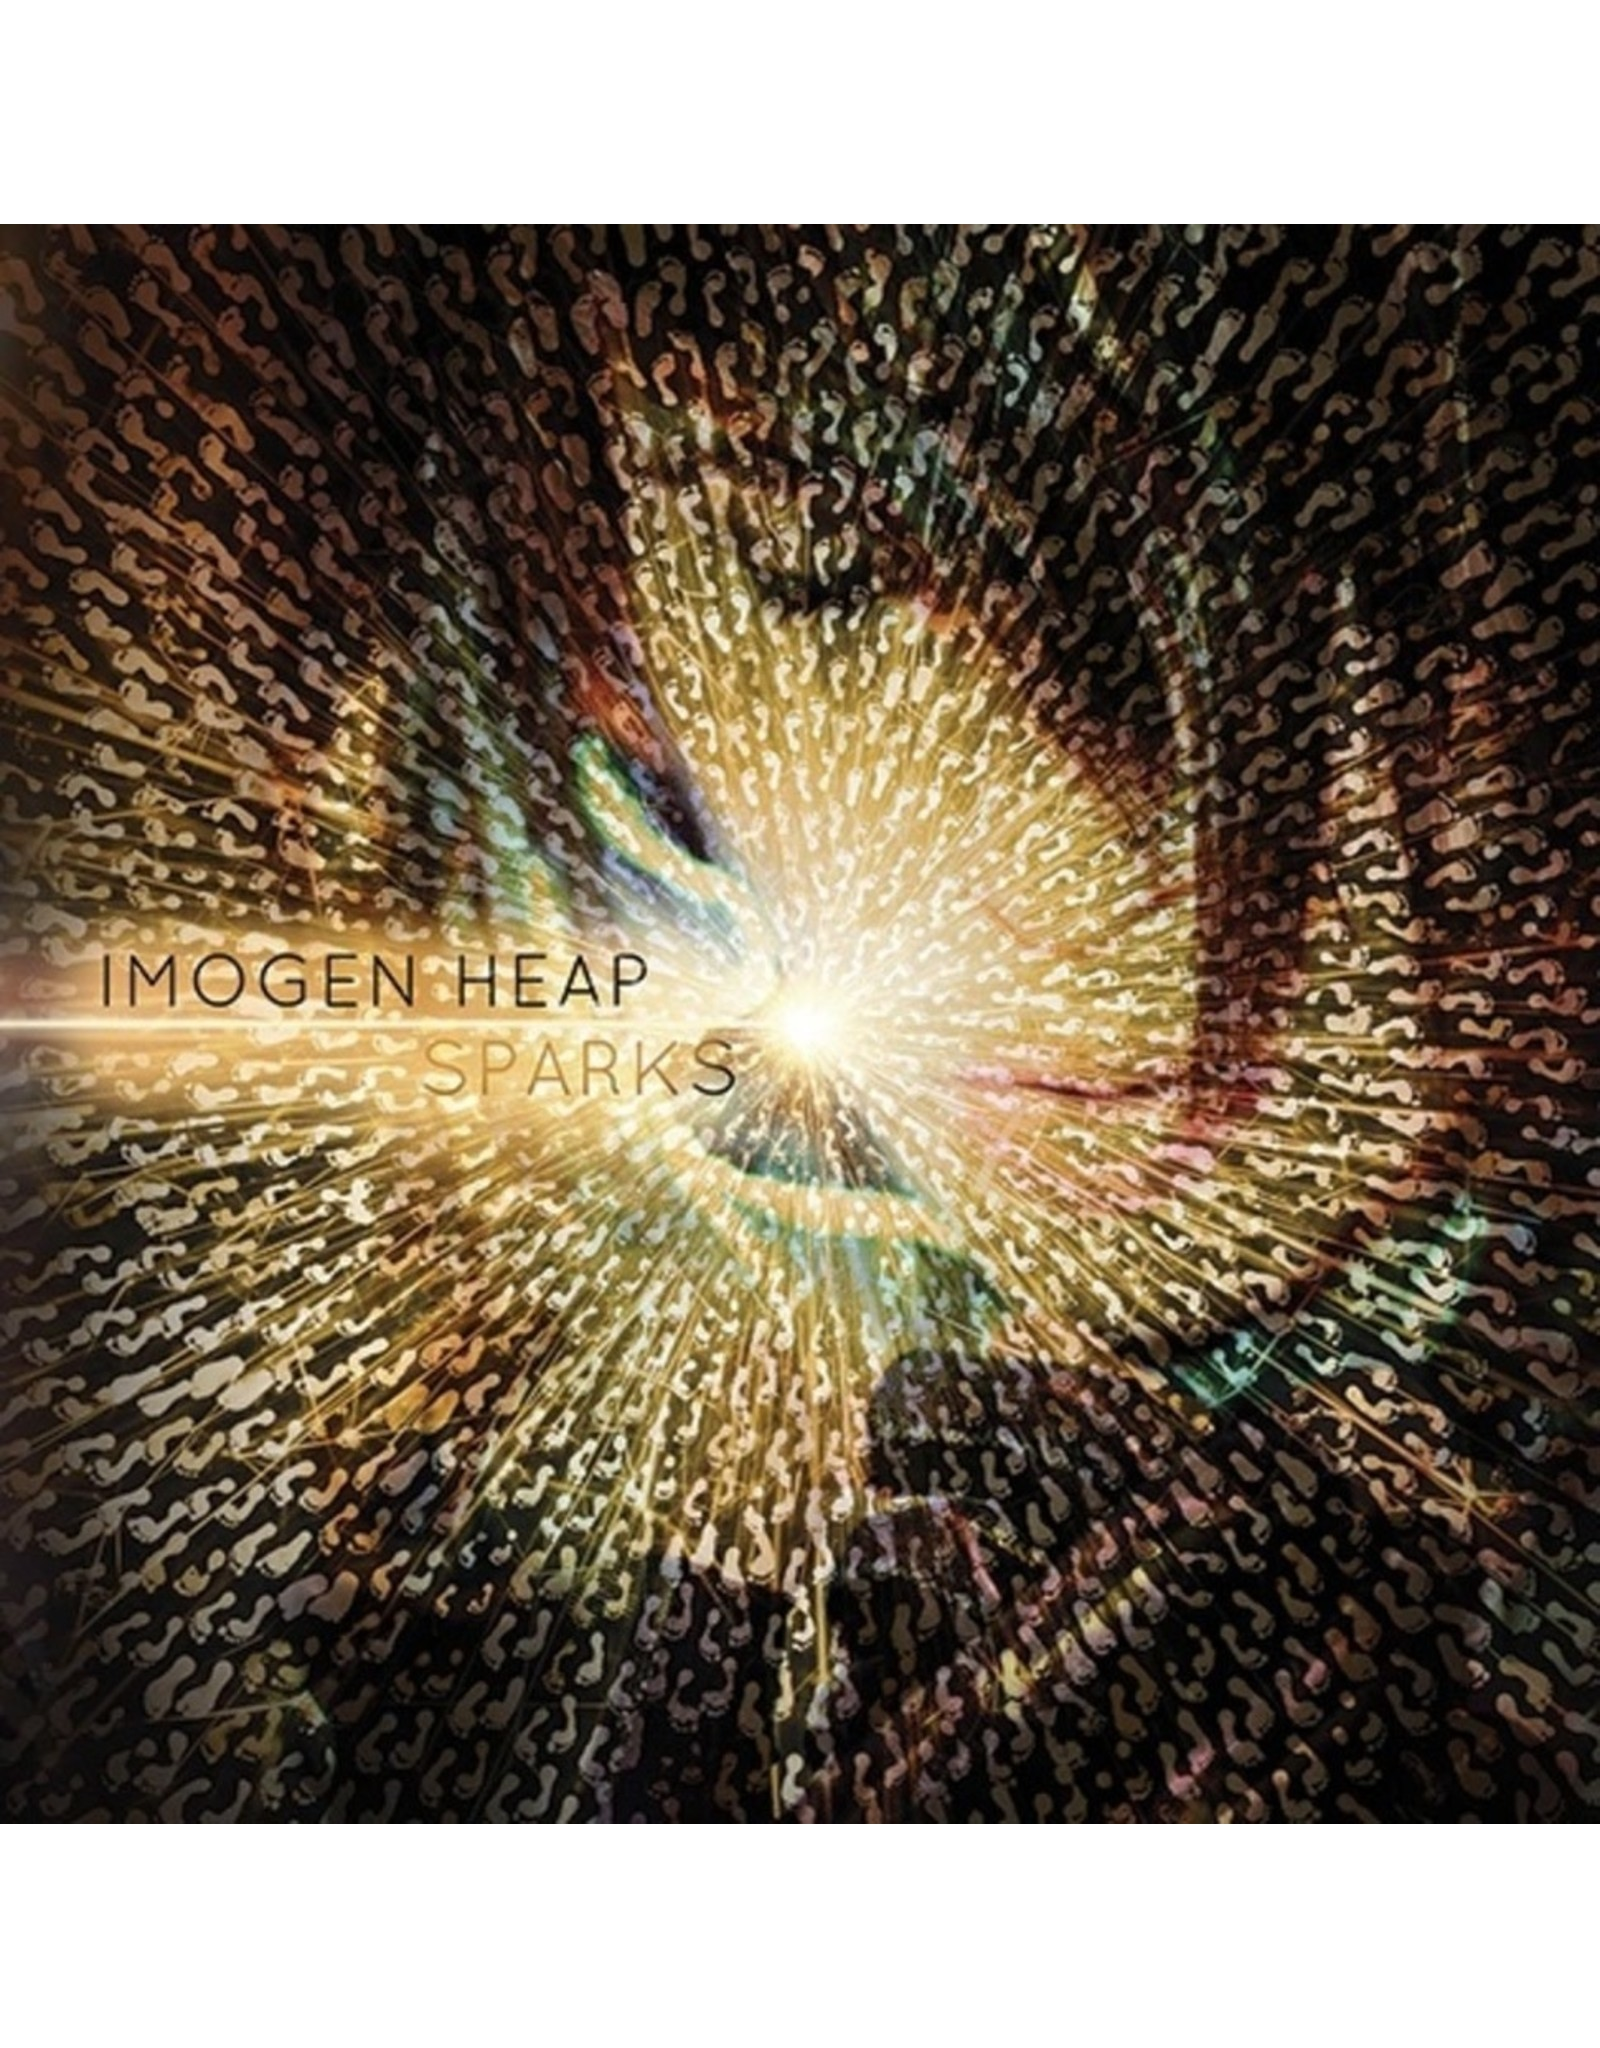 Imogen Heap - Sparks